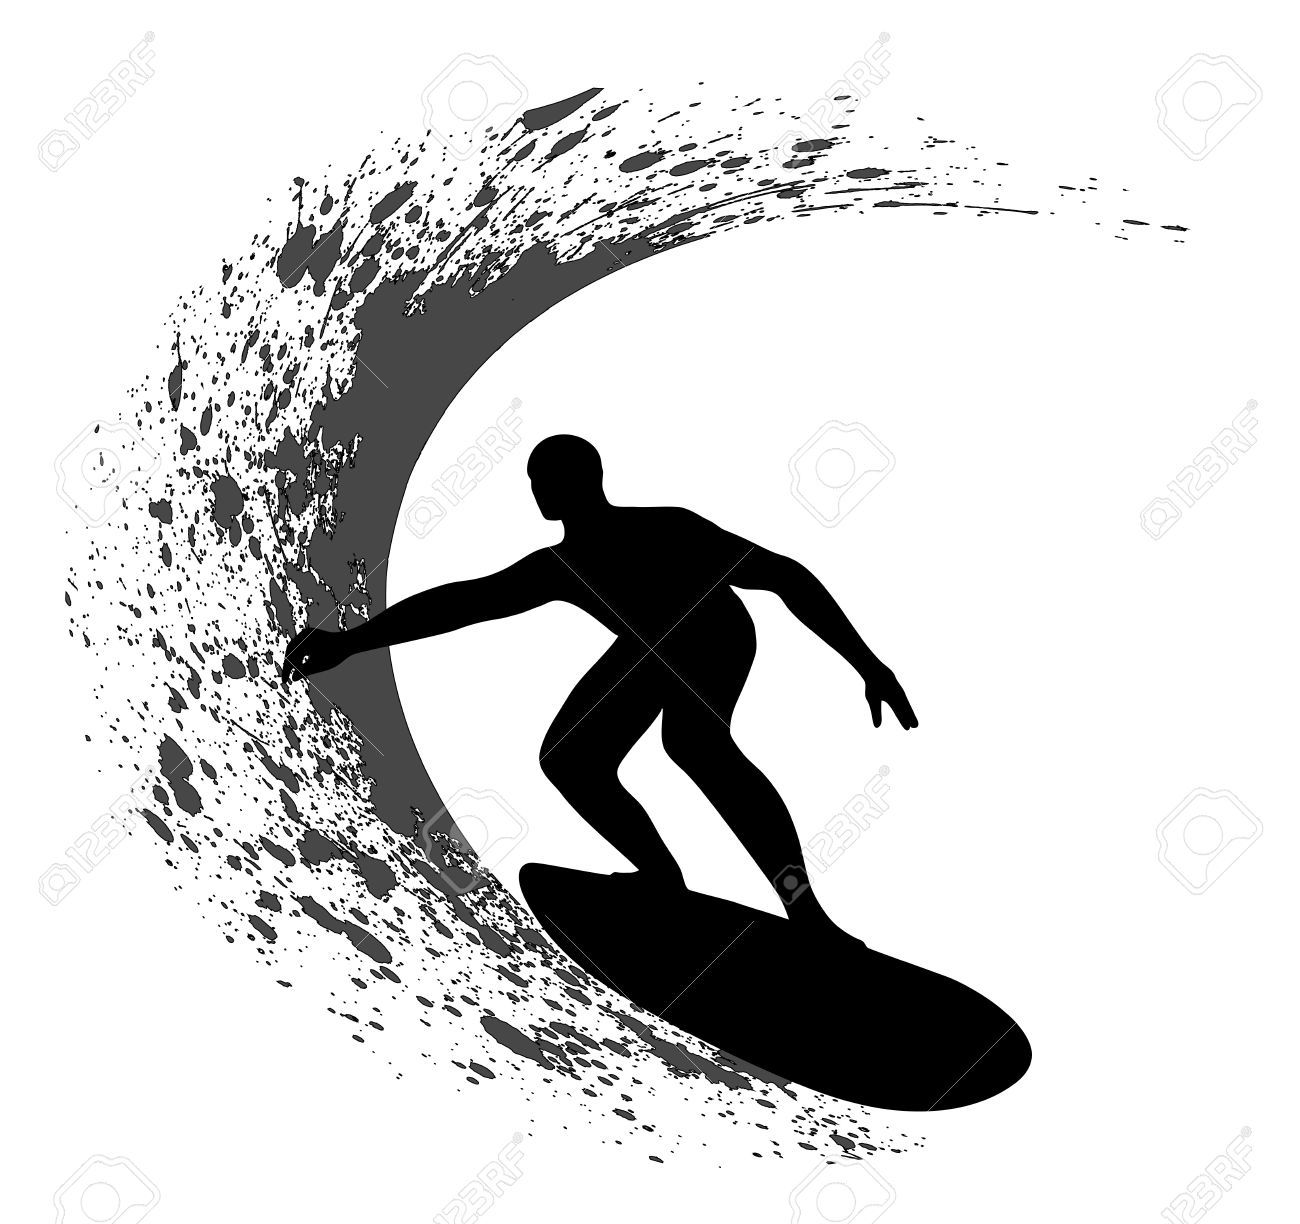 surfing silhouette: Surfer.